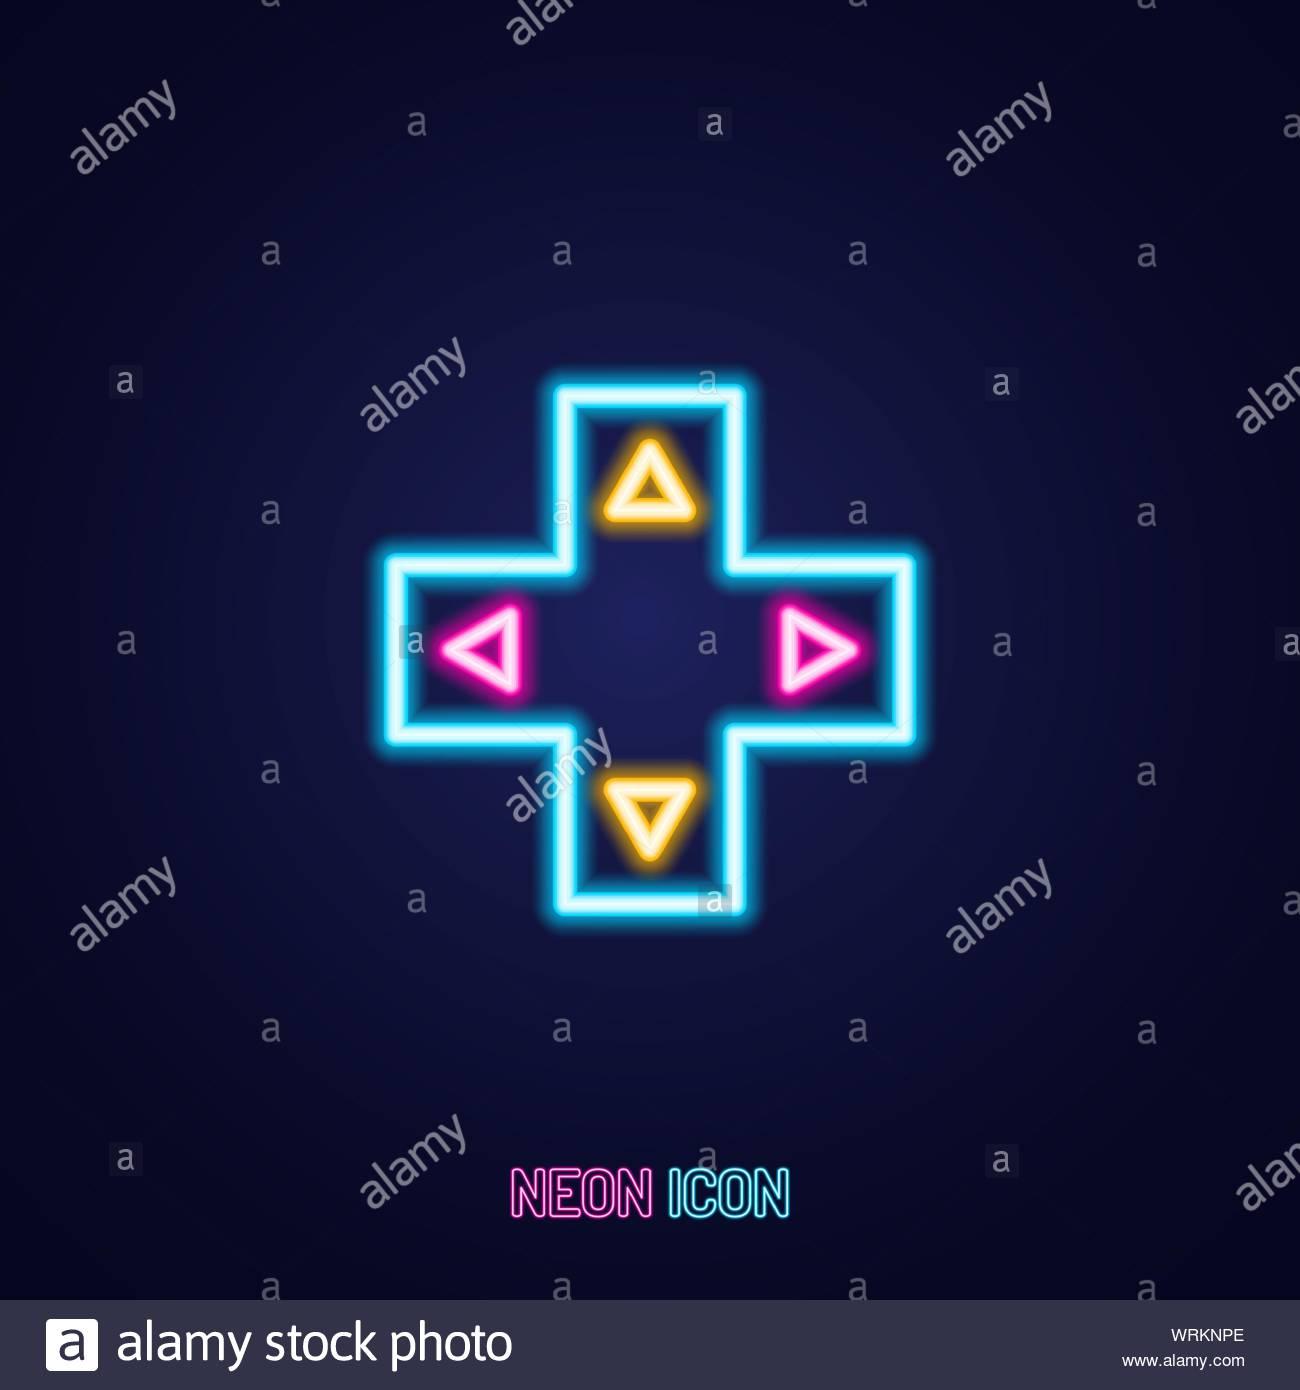 arrow joystick simple luminous neon outline colorful icon on blue 1300x1390